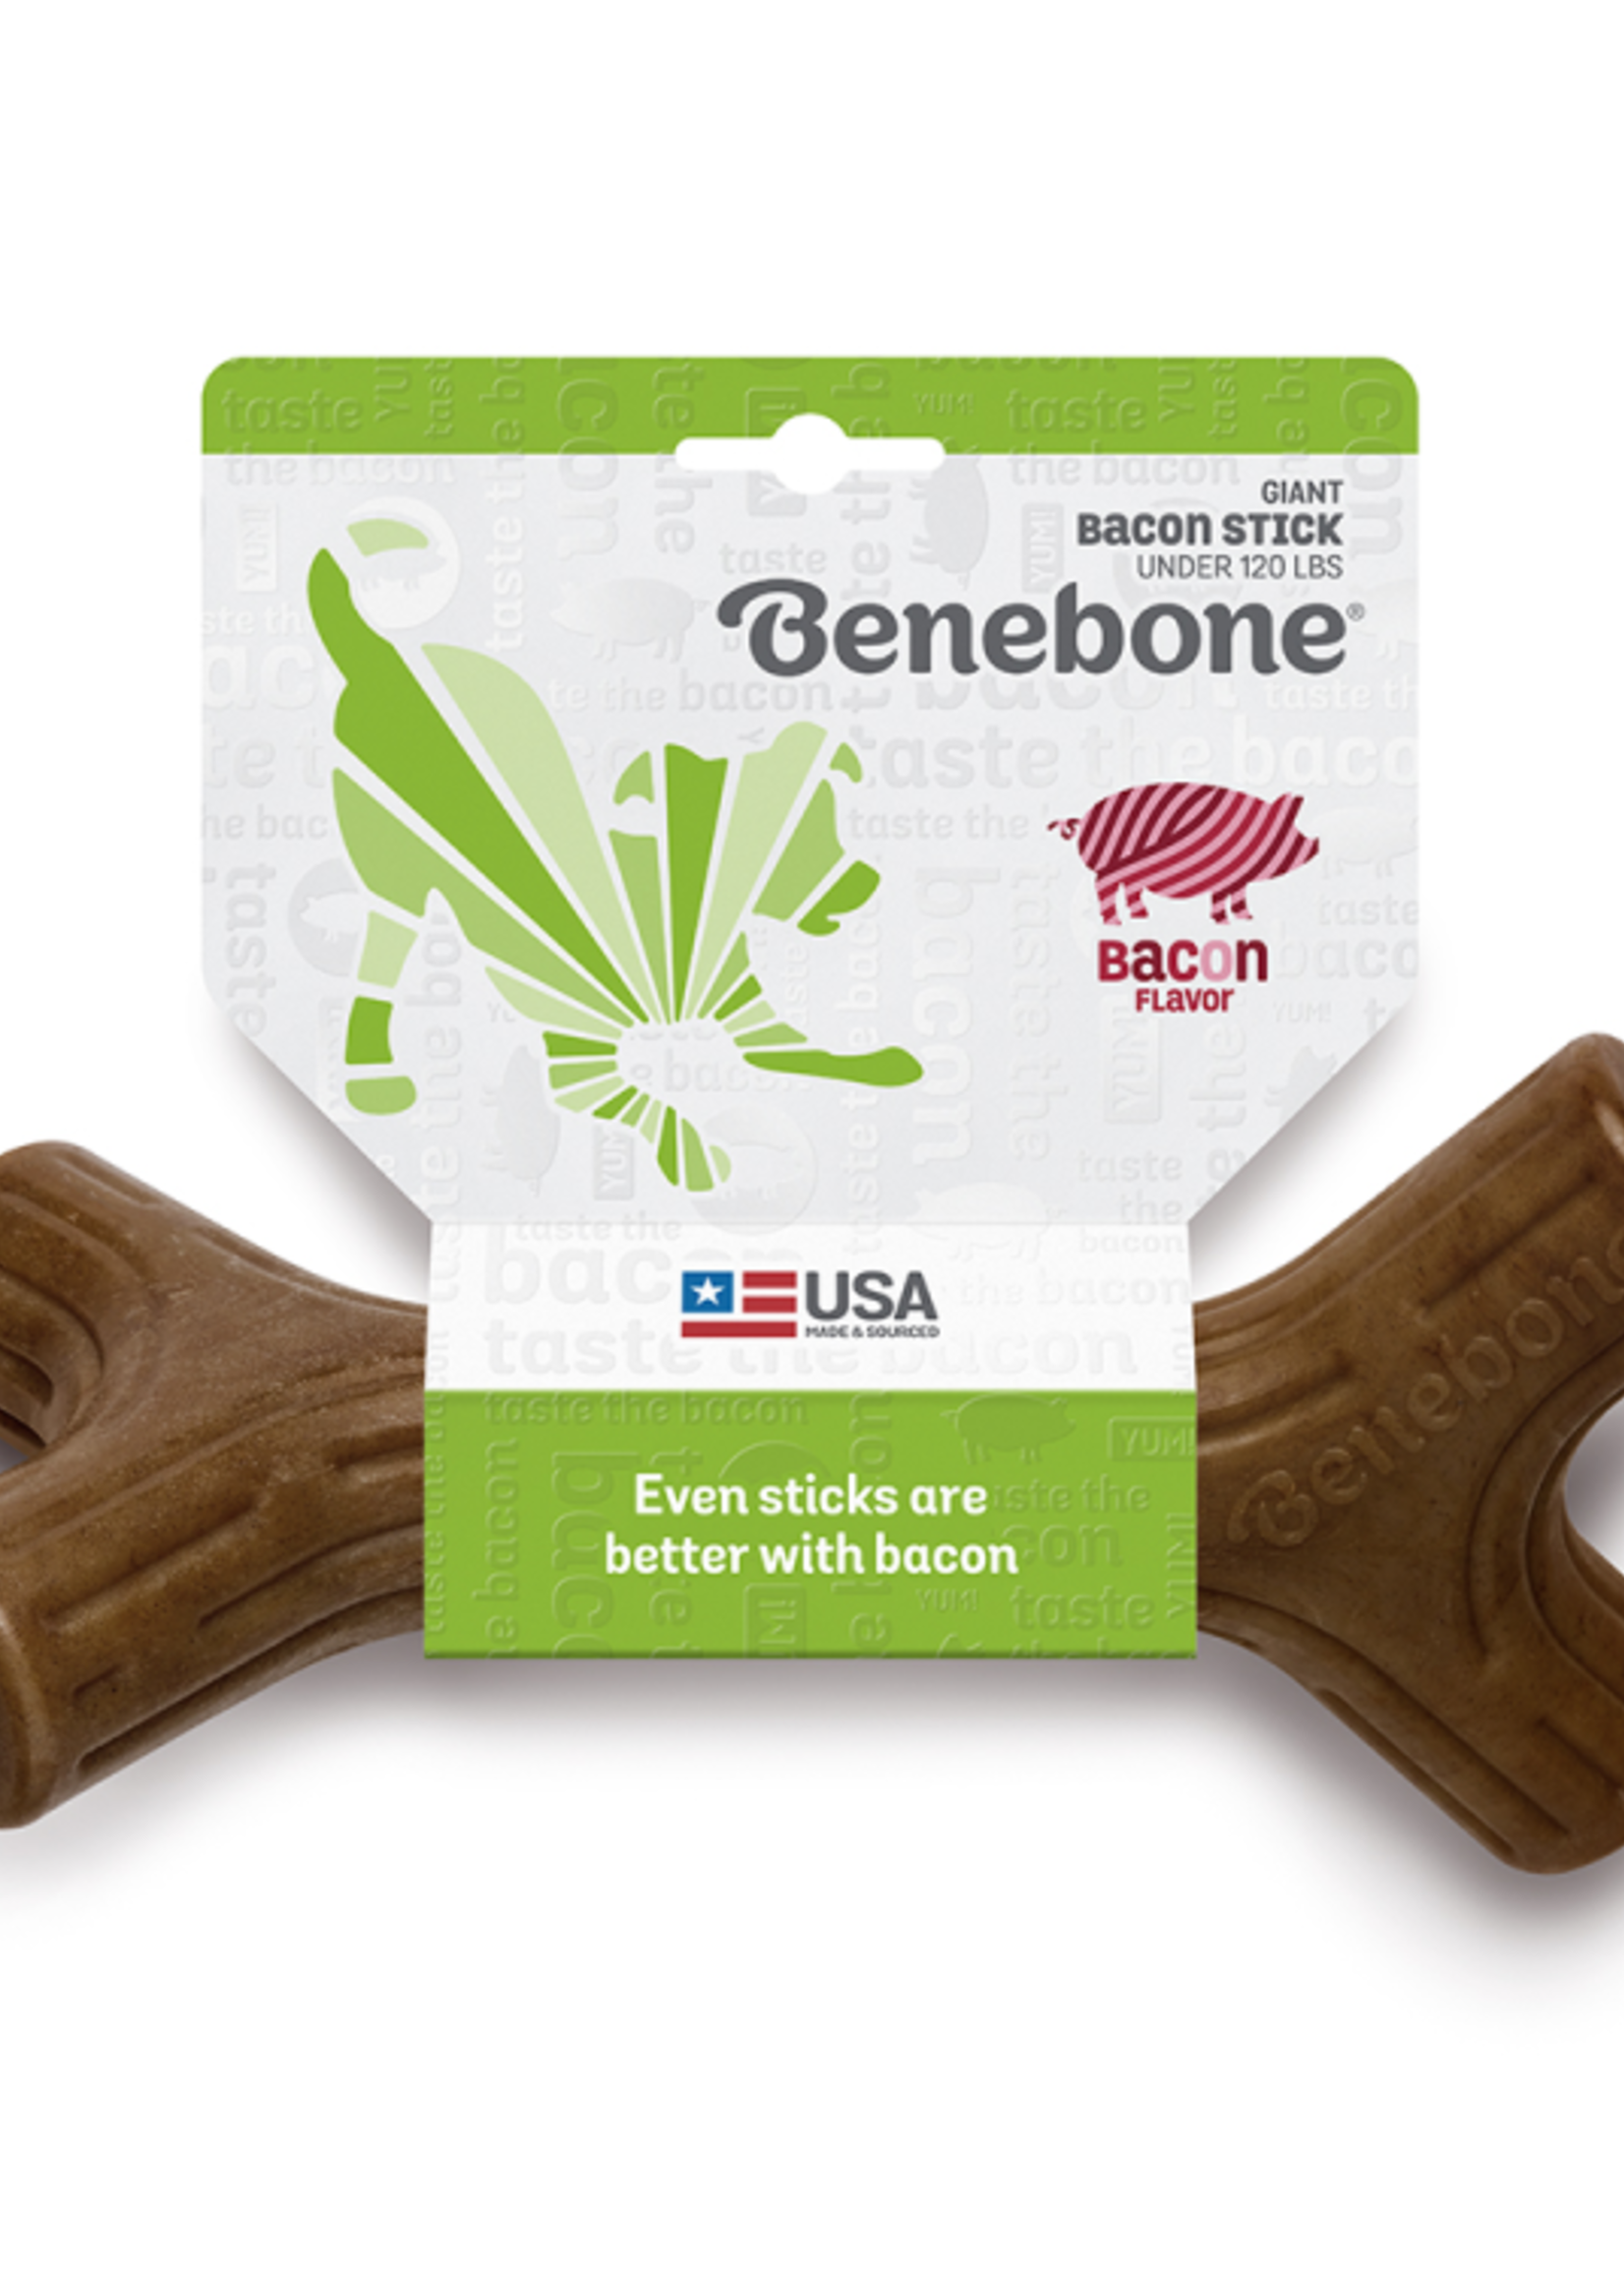 Benebone Stick  Giant - Giant